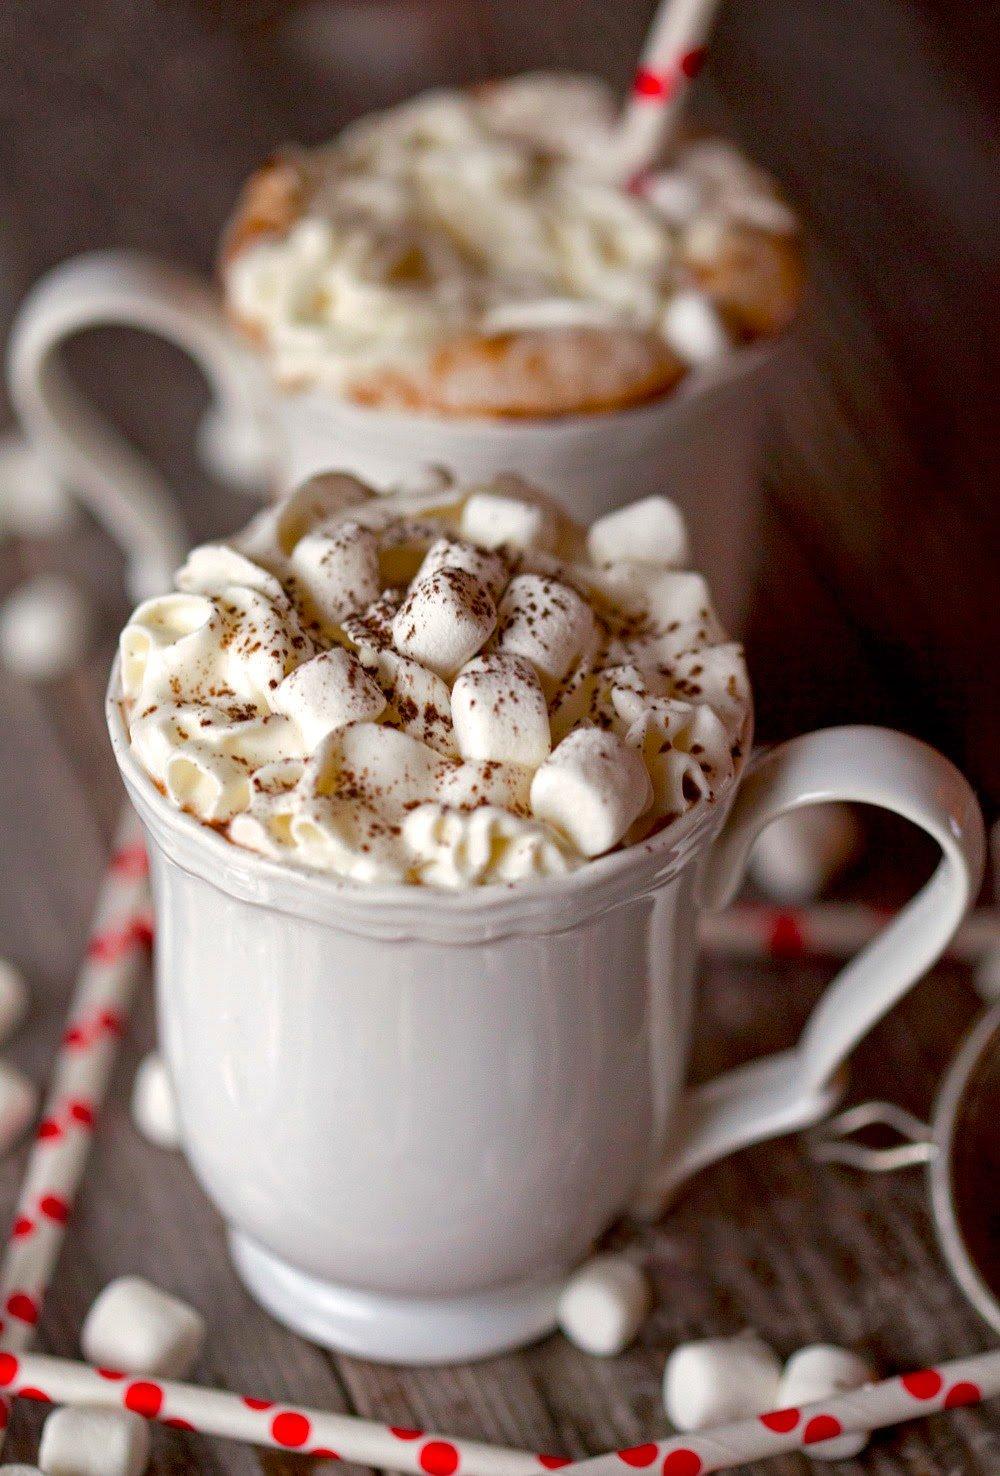 Кофе с зефиром маршмеллоу рецепт в домашних условиях